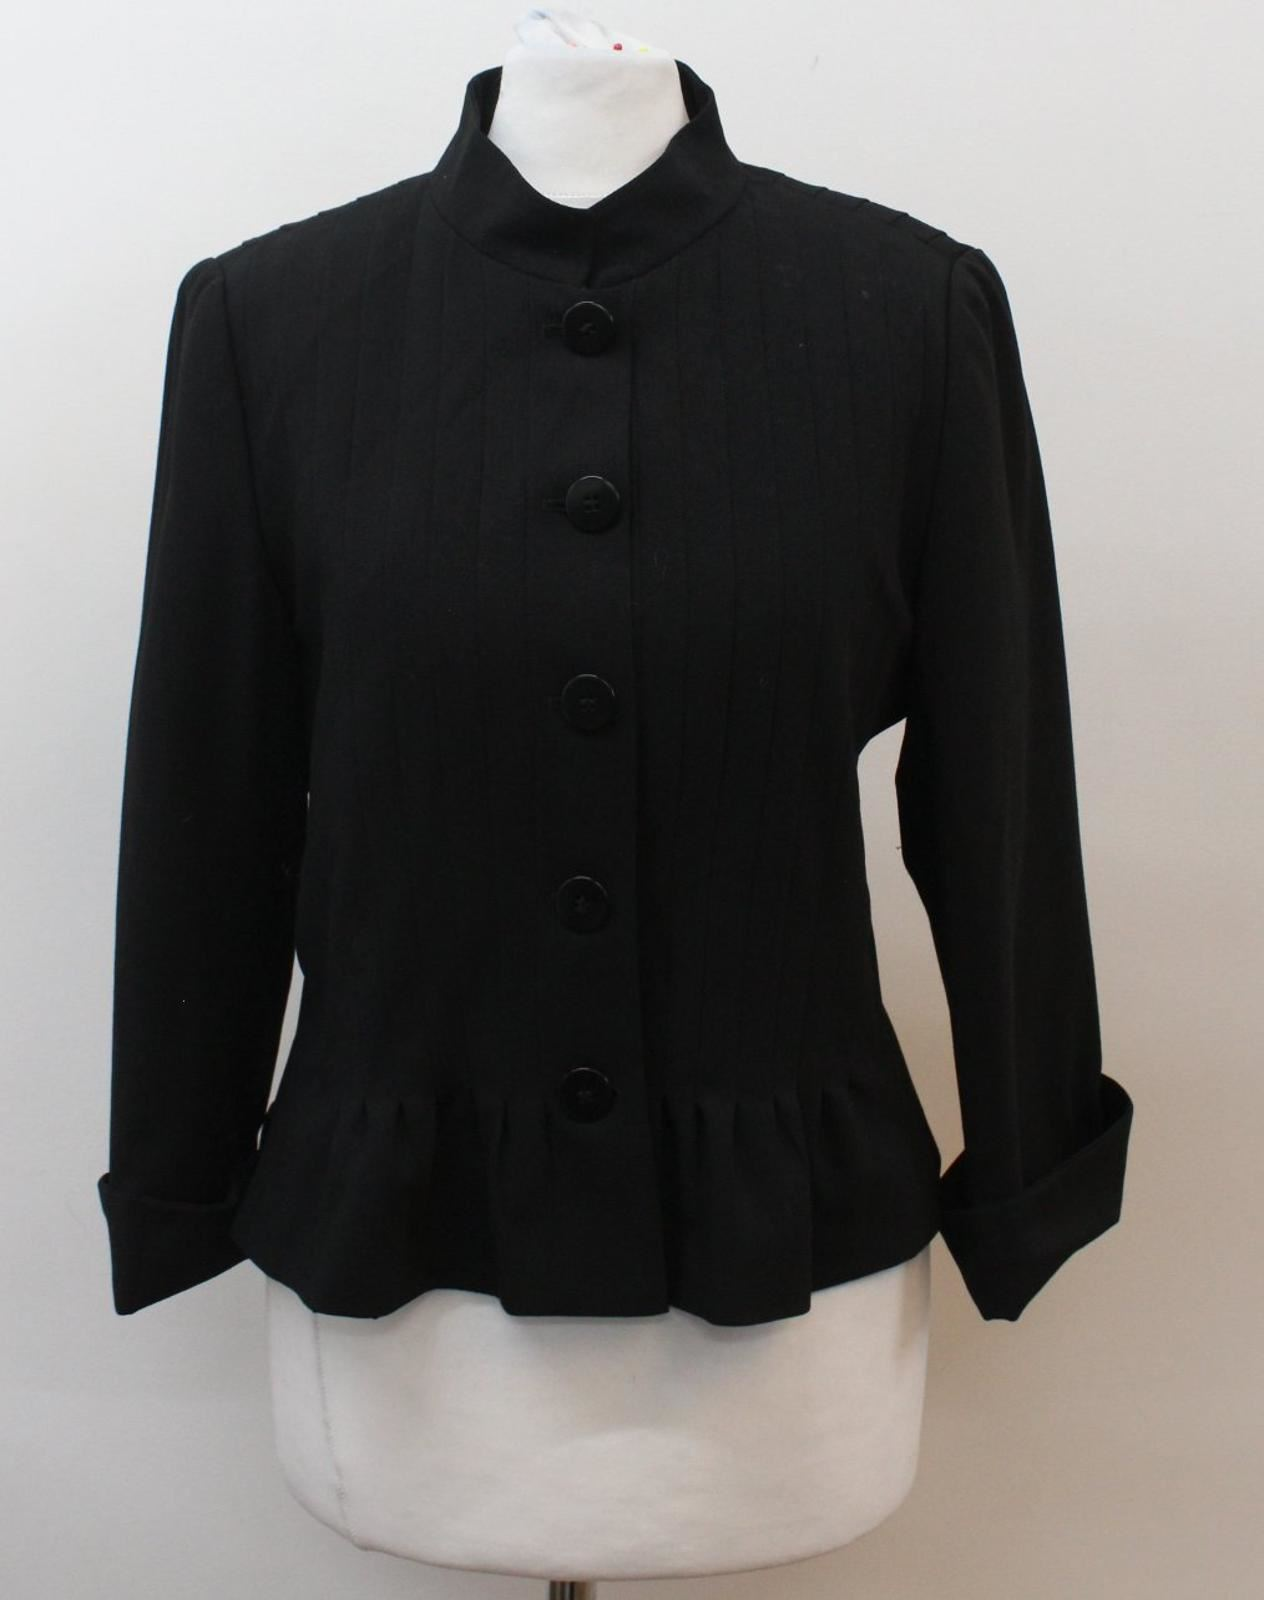 ARMANI-COLLEZIONI-Ladies-Black-Wool-3-4-Sleeve-Panelled-Blazer-Jacket-IT44-UK12